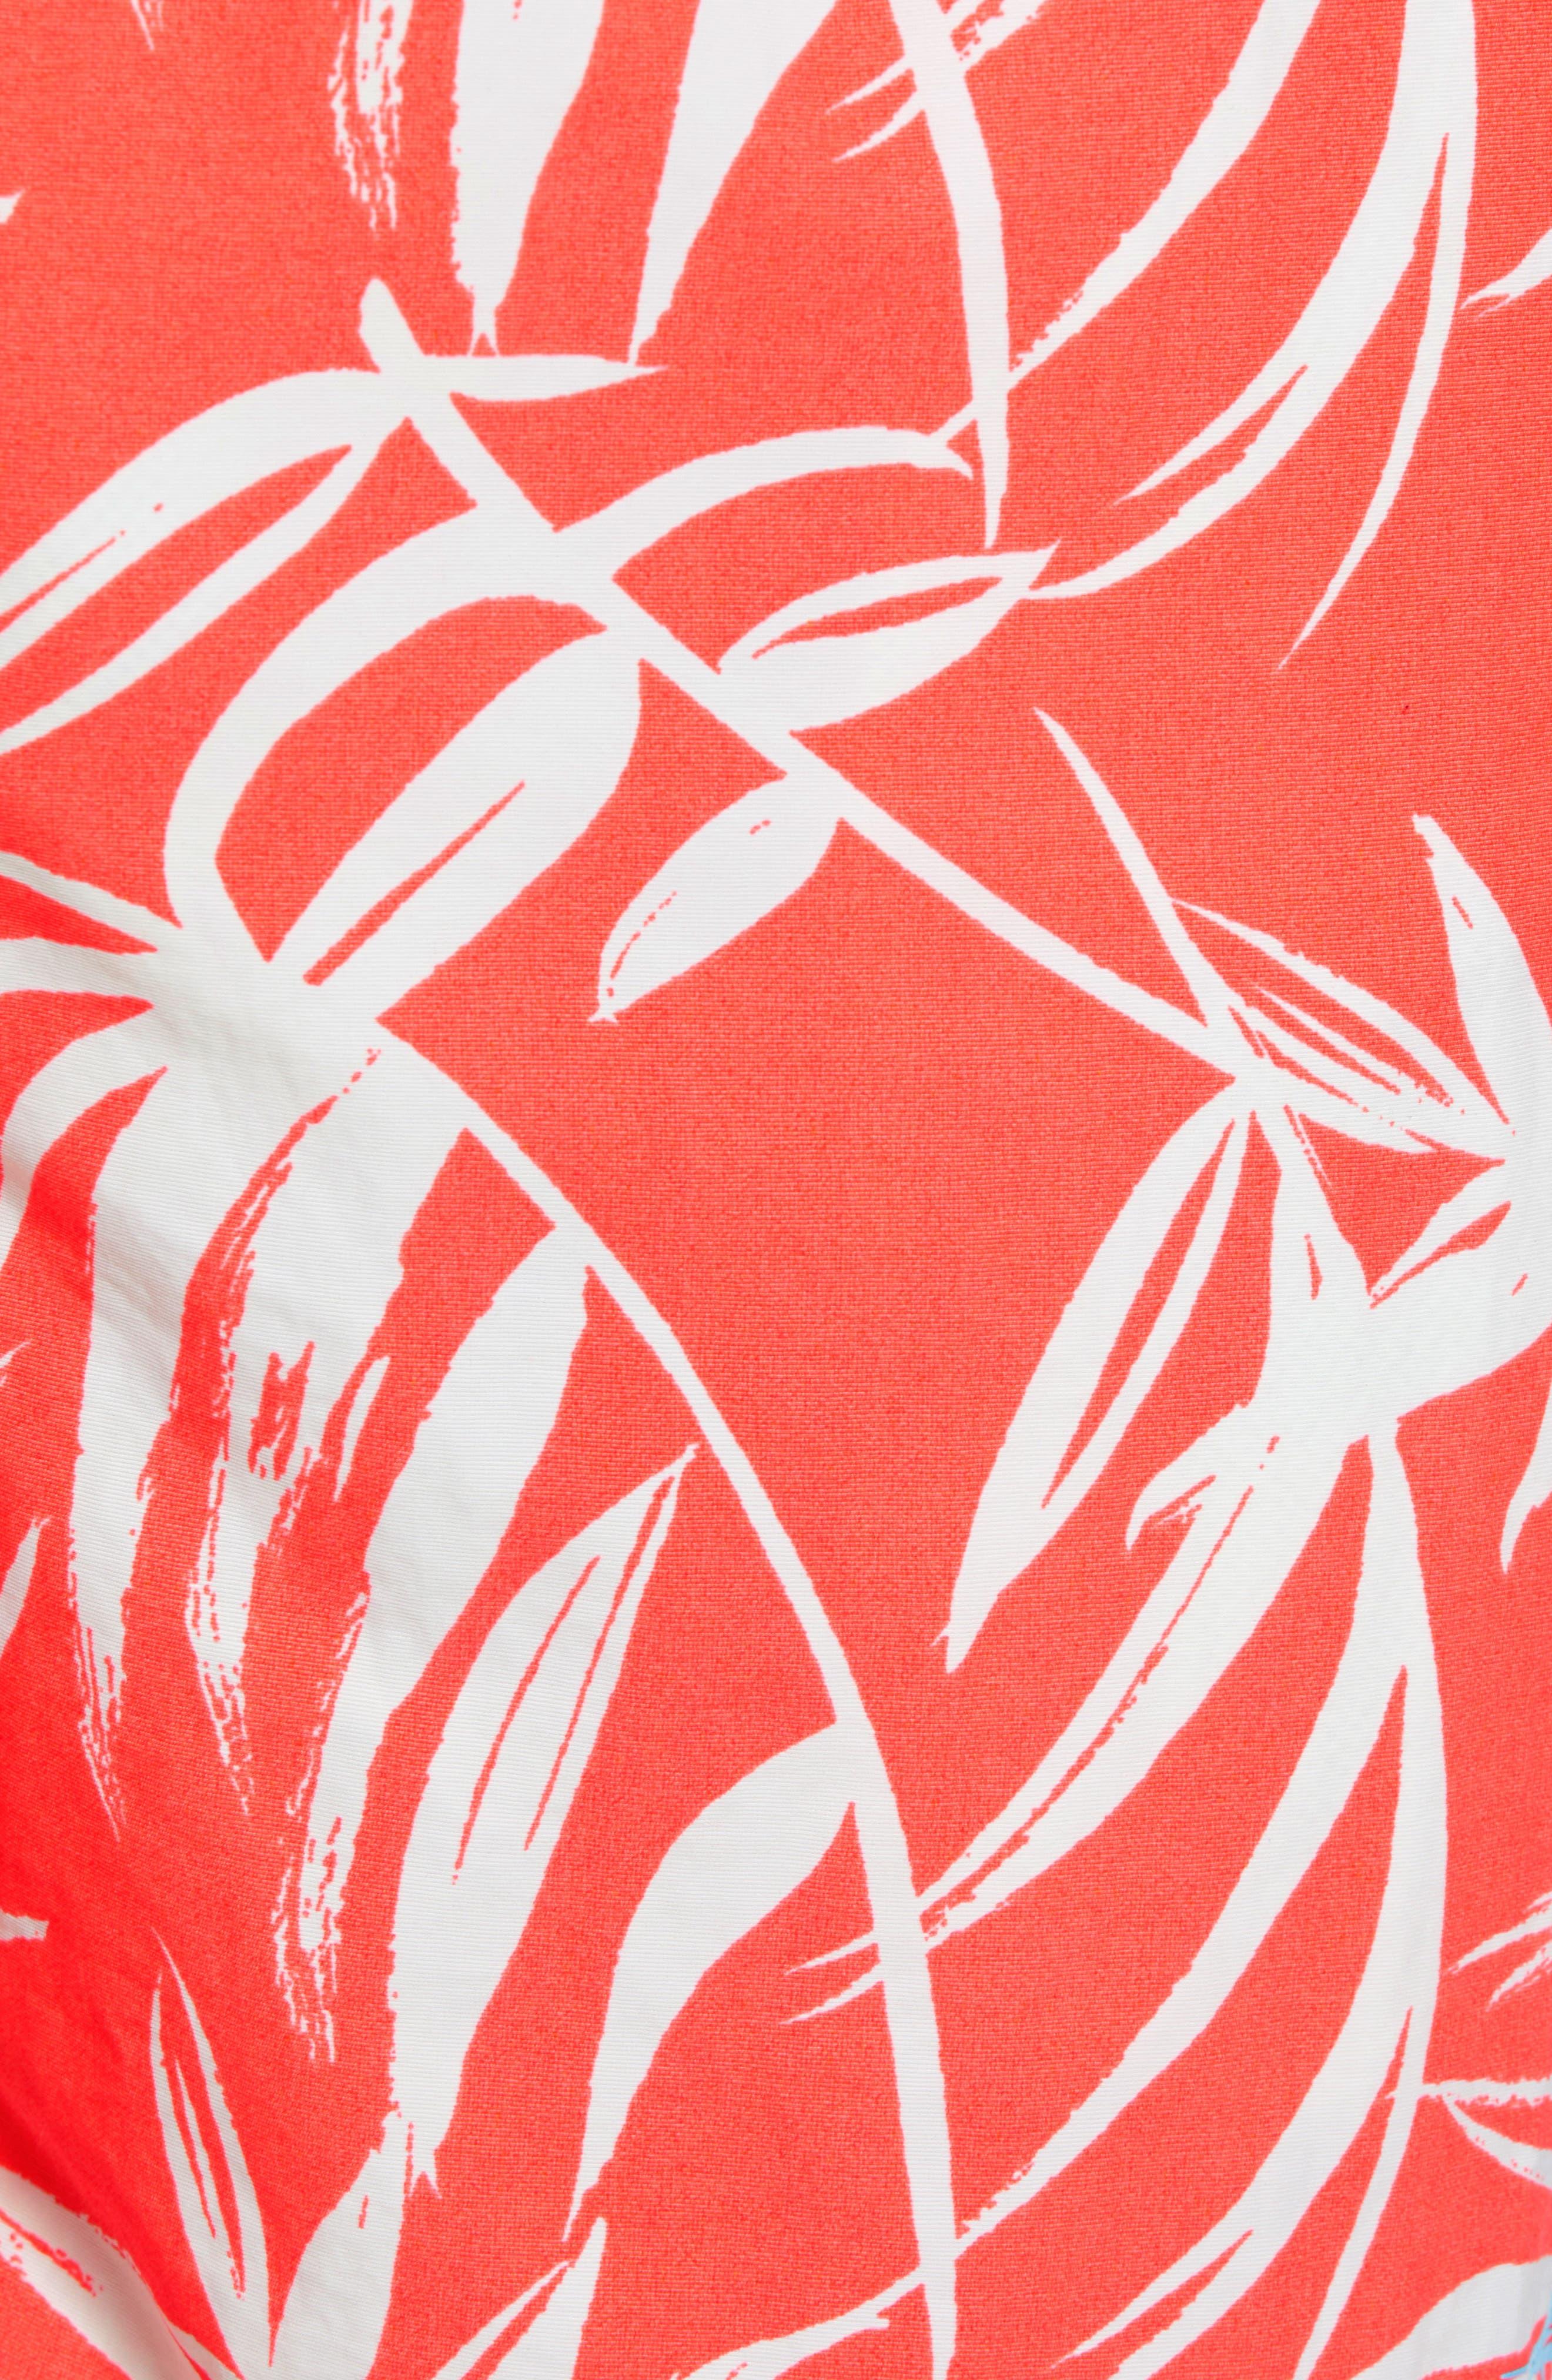 Naples Muy Caliente Swim Trunks,                             Alternate thumbnail 5, color,                             800